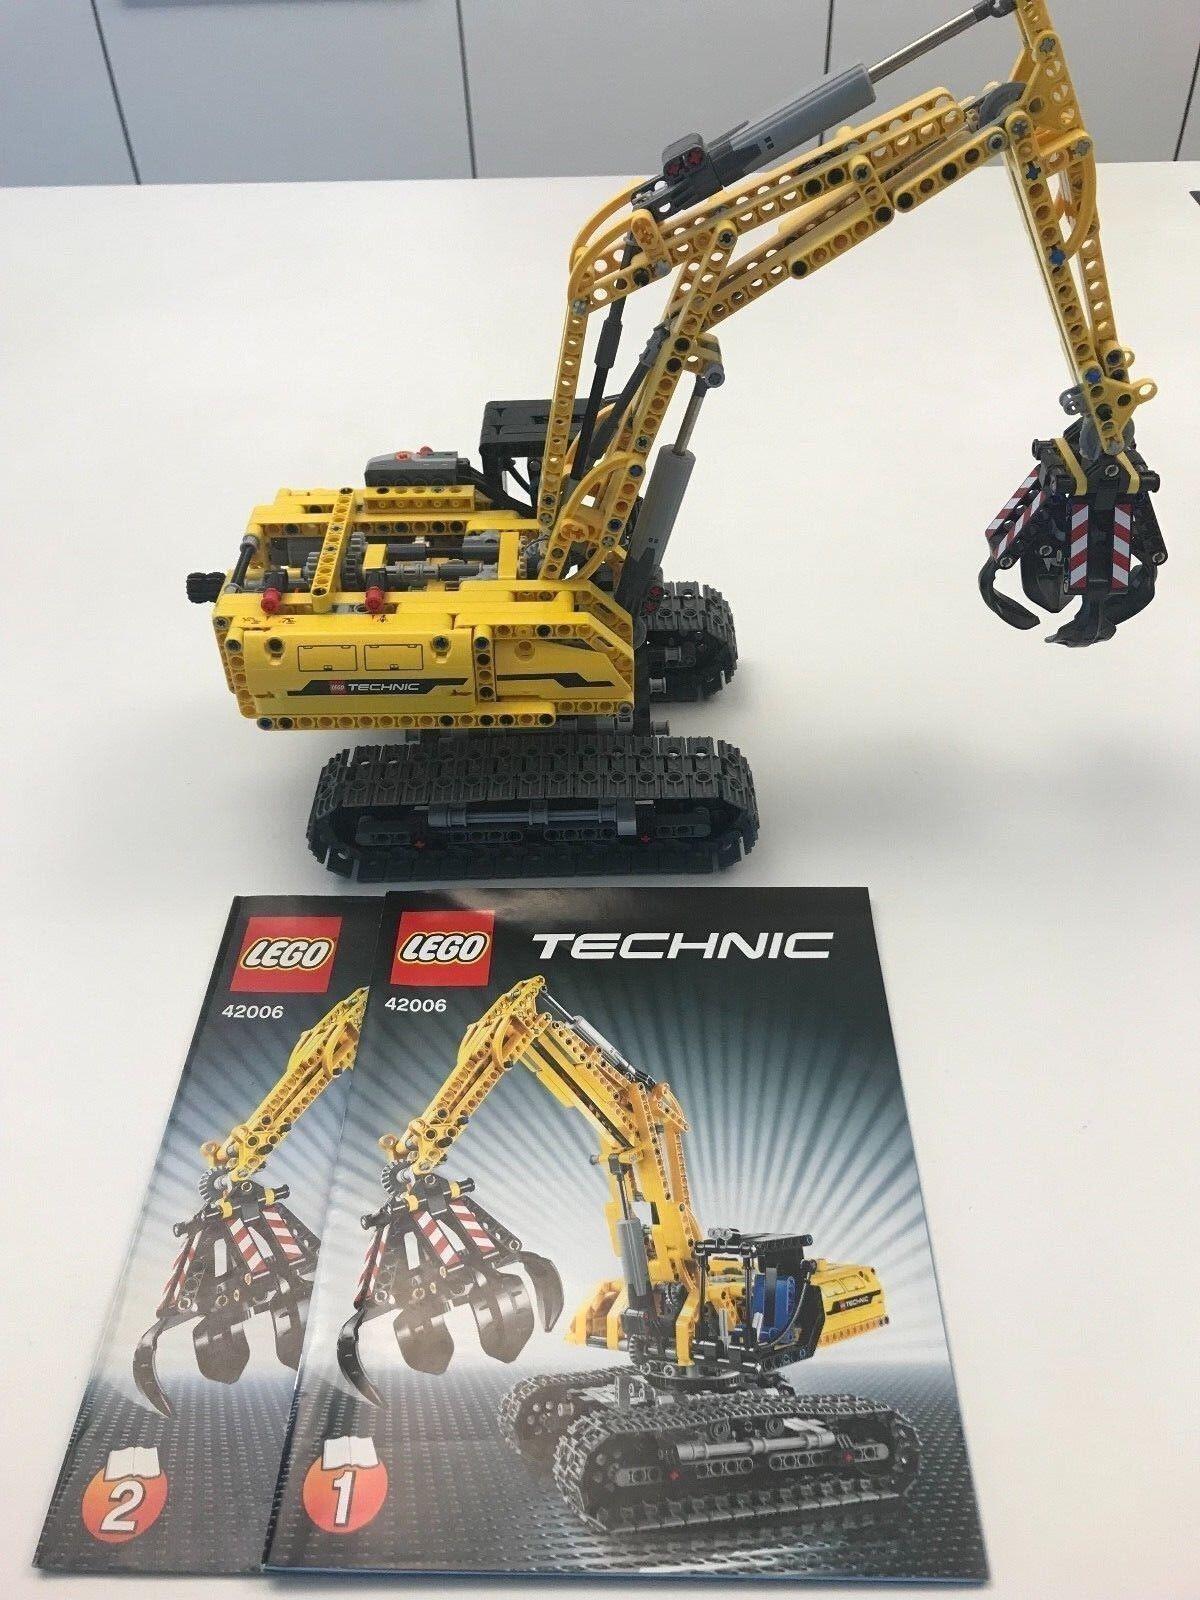 LEGO Technic (42006) Raupenbagger 10-16 Jahre top inkl. Bauanleitung